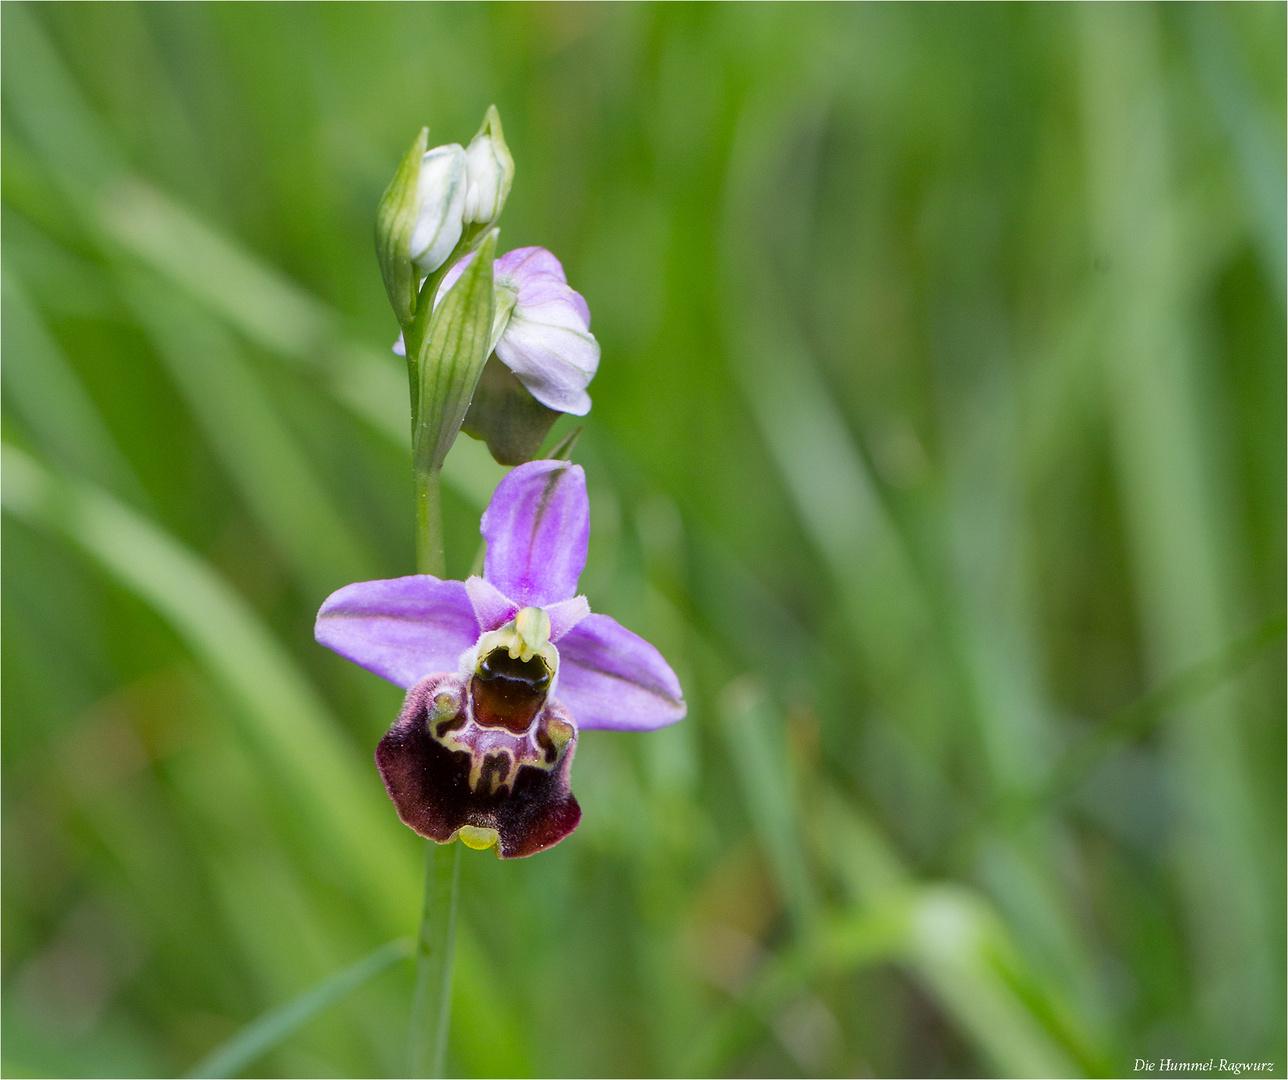 Hummel-Ragwurz (Ophrys holoserica) 41.2